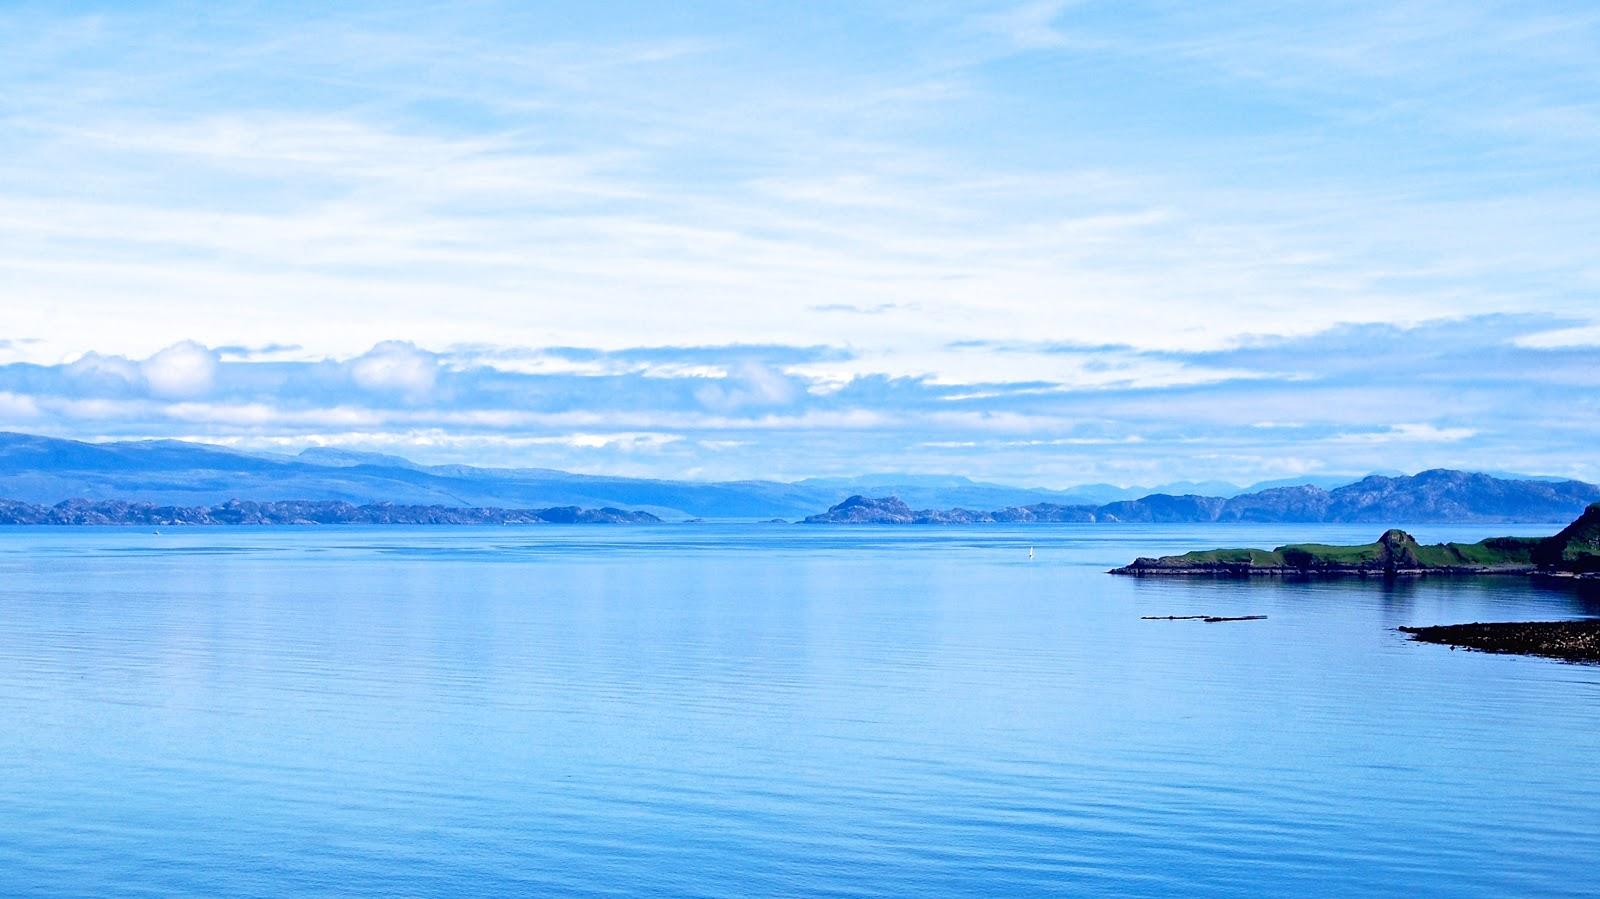 View from the Isle of Skye toward mainland Scotland